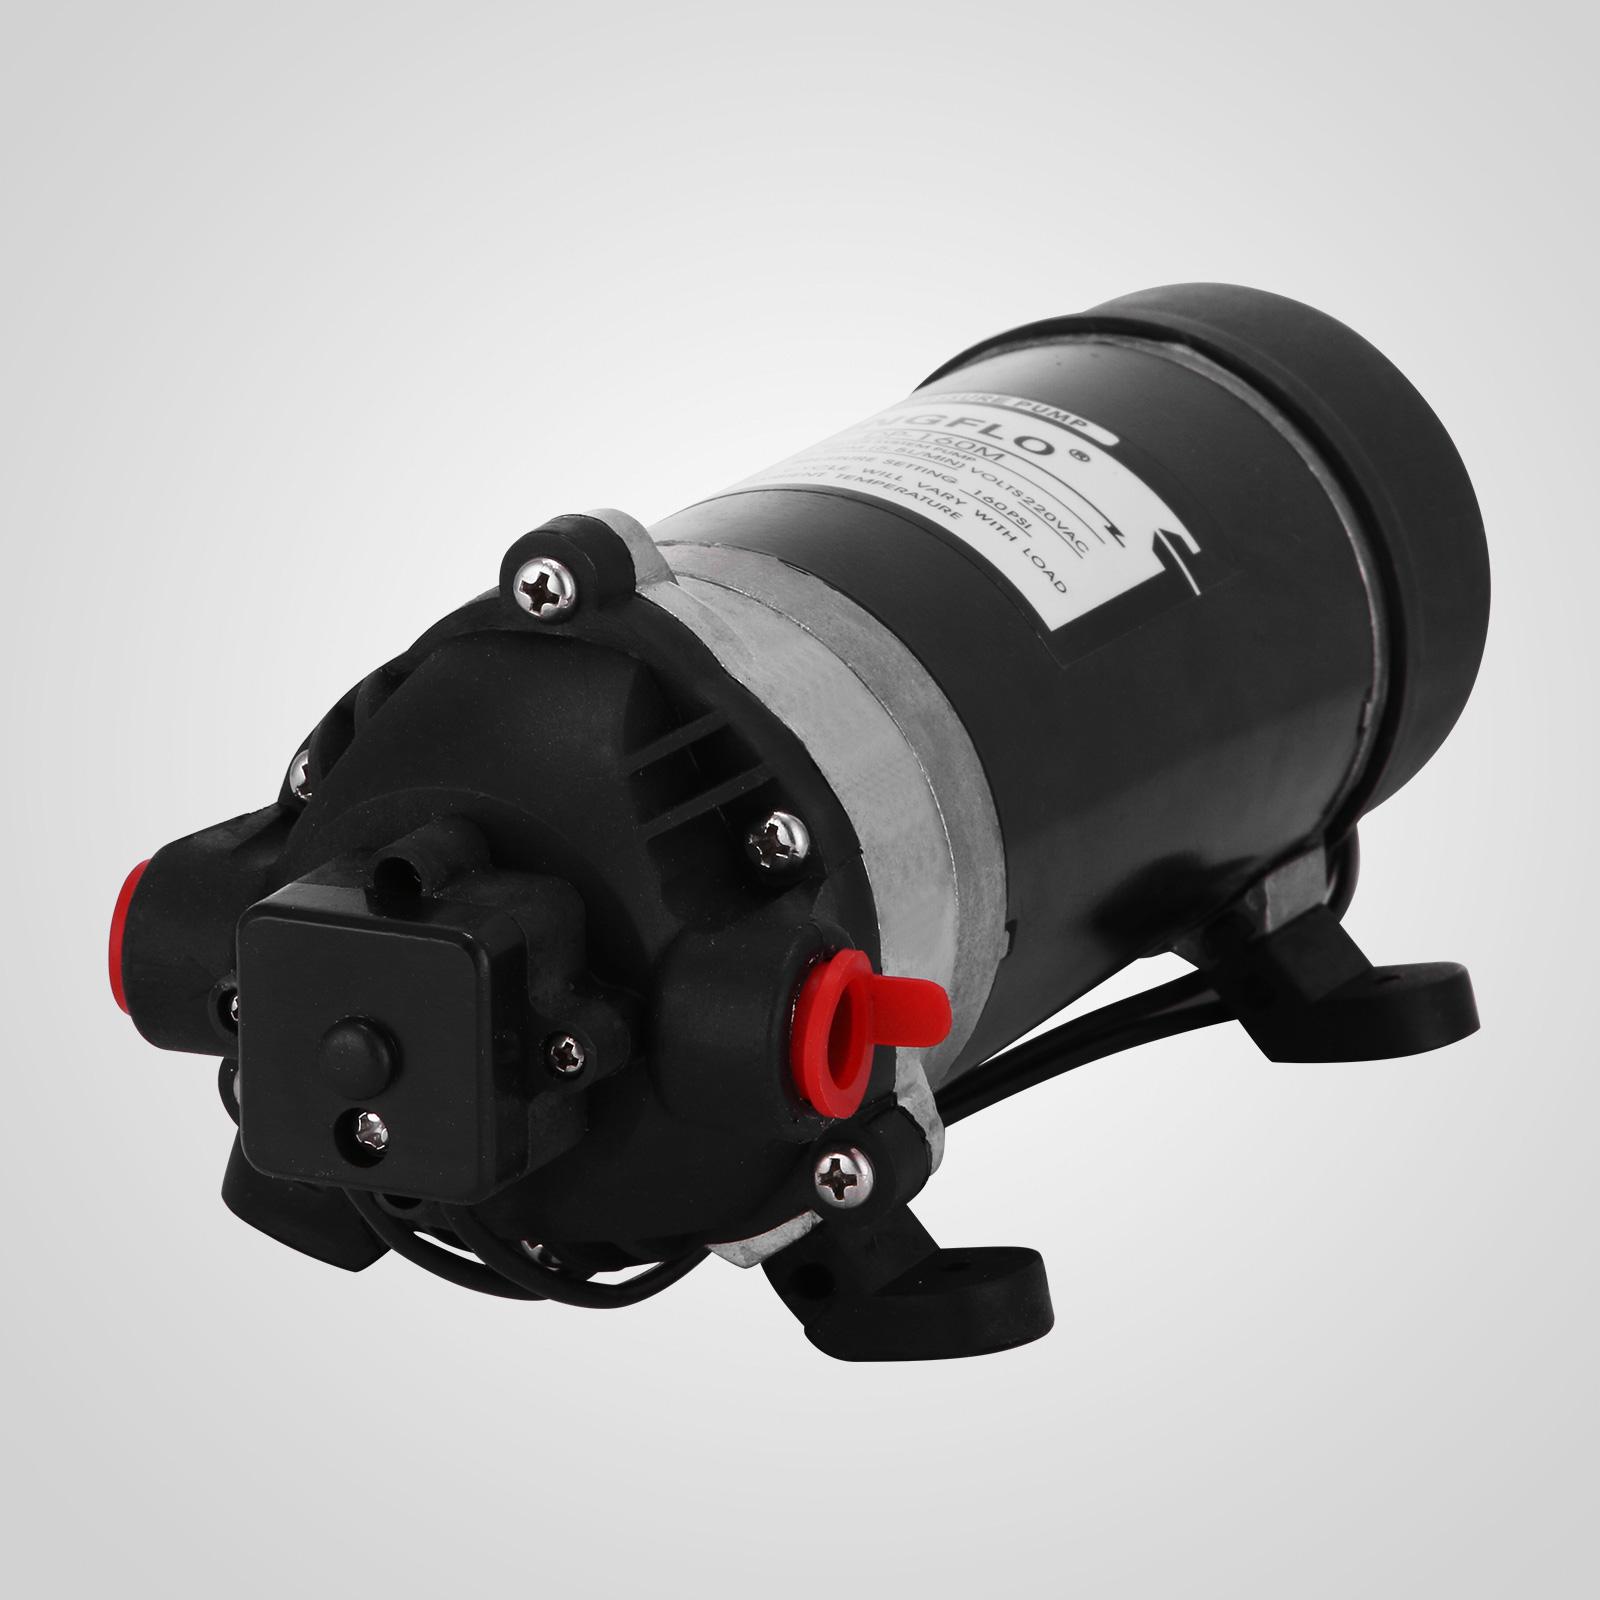 12V 60PSI Druckwasserpumpe Hochdruck Membranpumpe  Caravan  Automatik  Auto